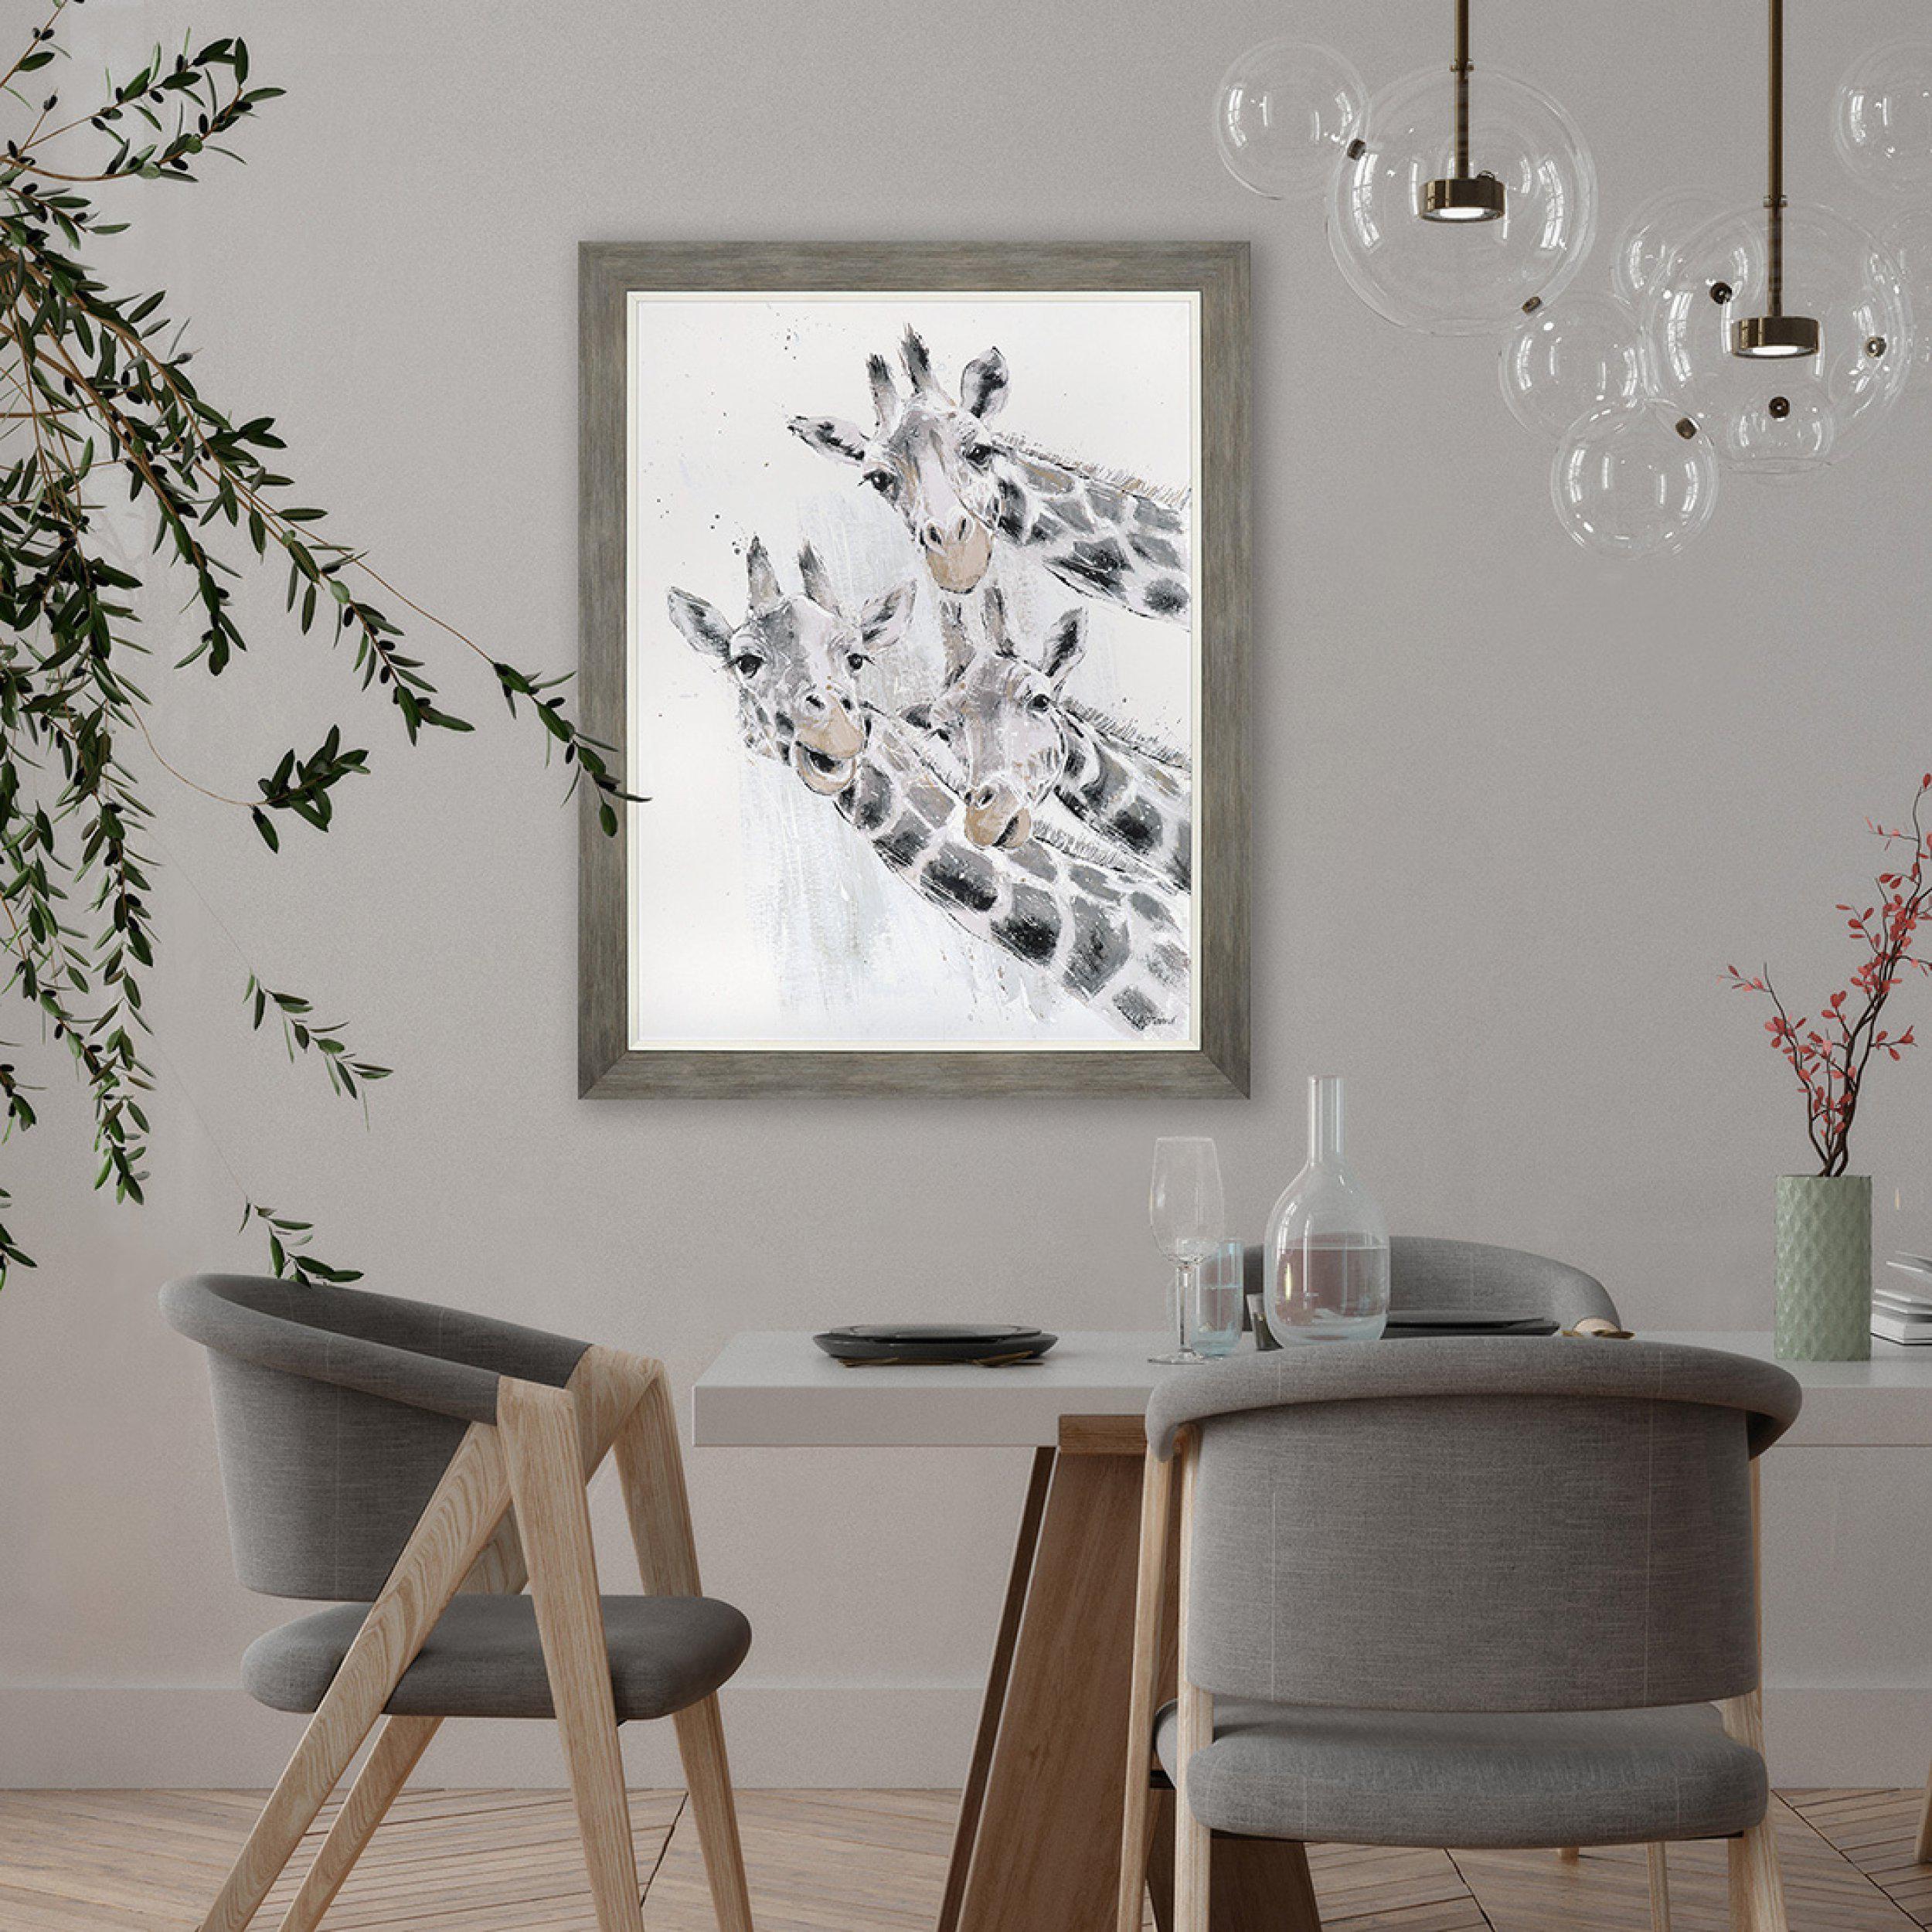 Wall Art Gallery - Leaning Tower - Giraffes Painting by Artist Adelene Fletcher - Room Display